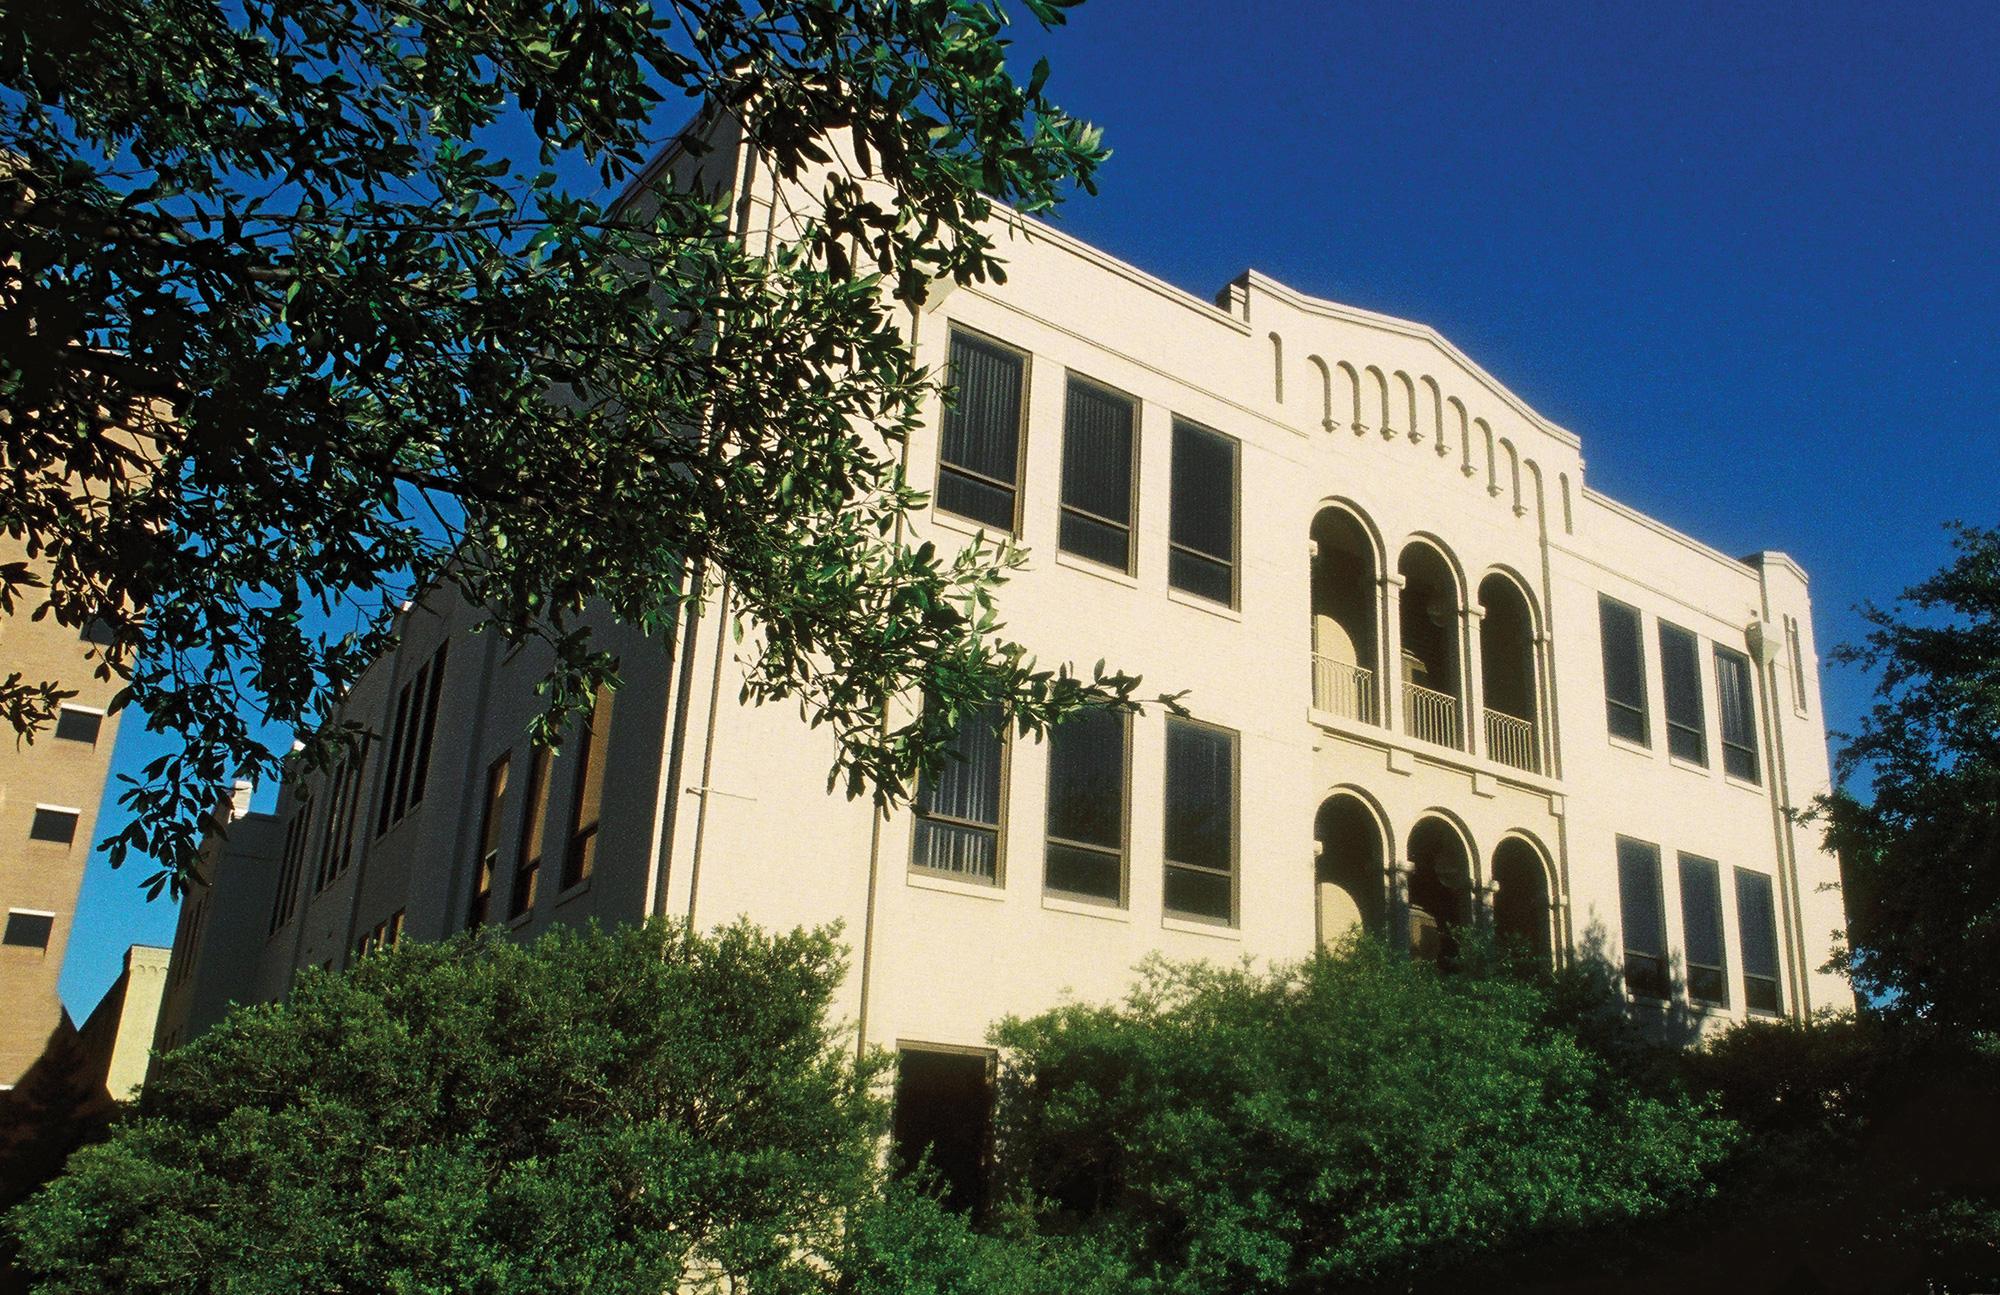 The University of Texas at Arlington   University of Texas